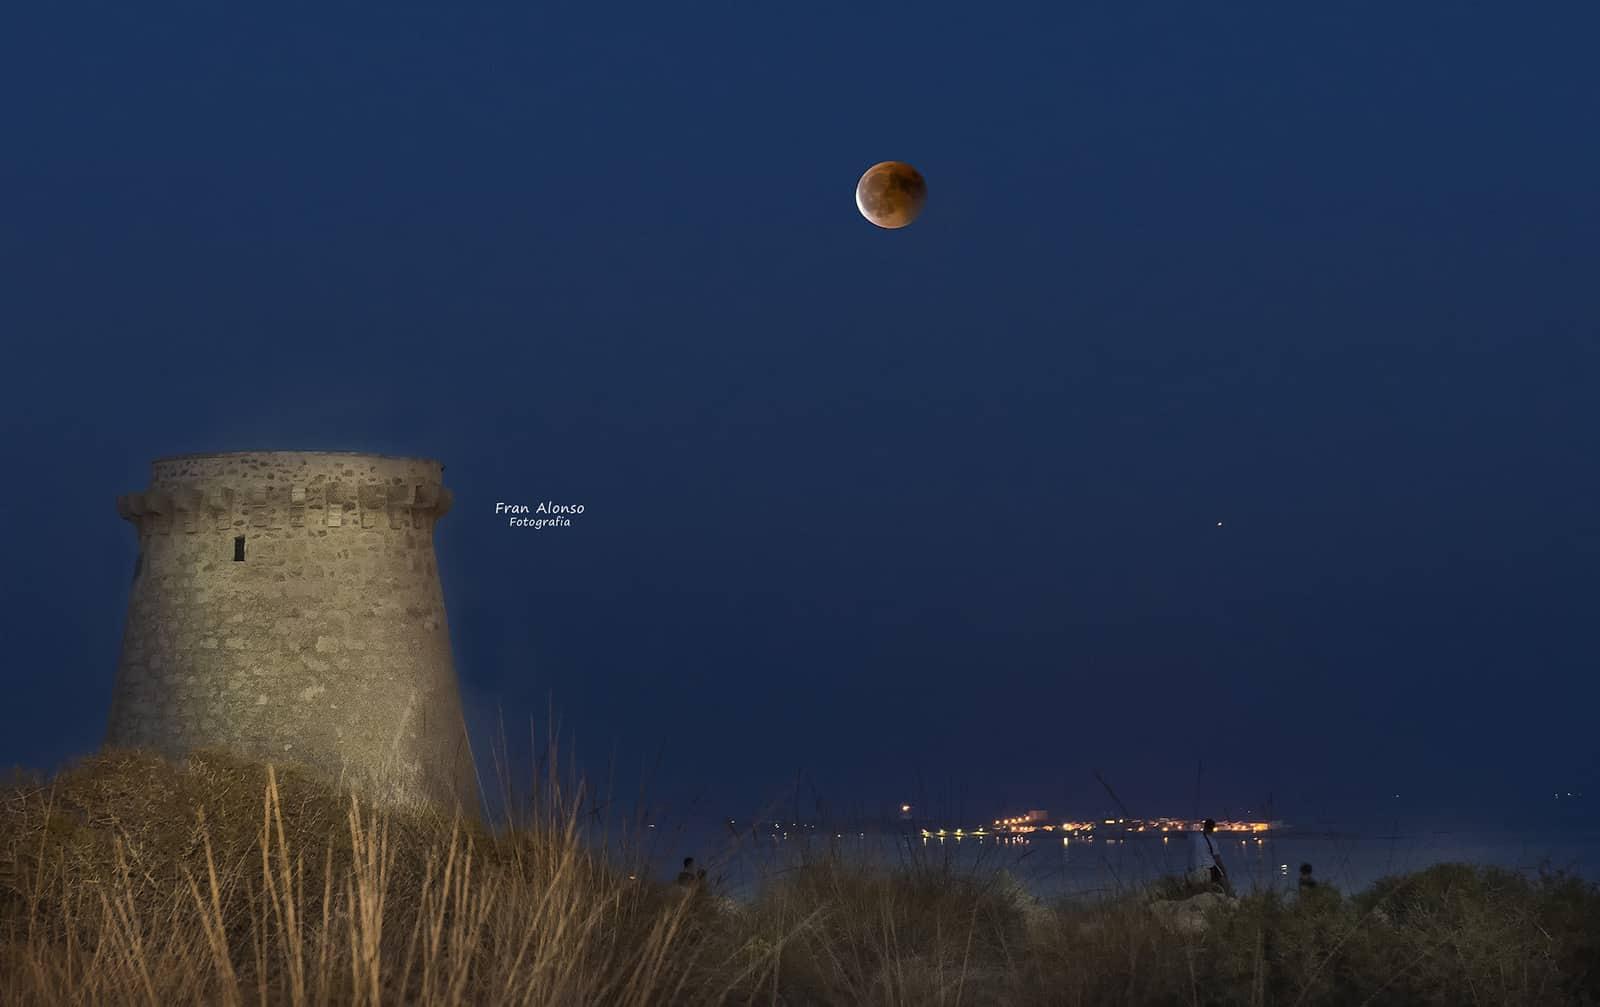 1532818533_luna eclipse moon 2